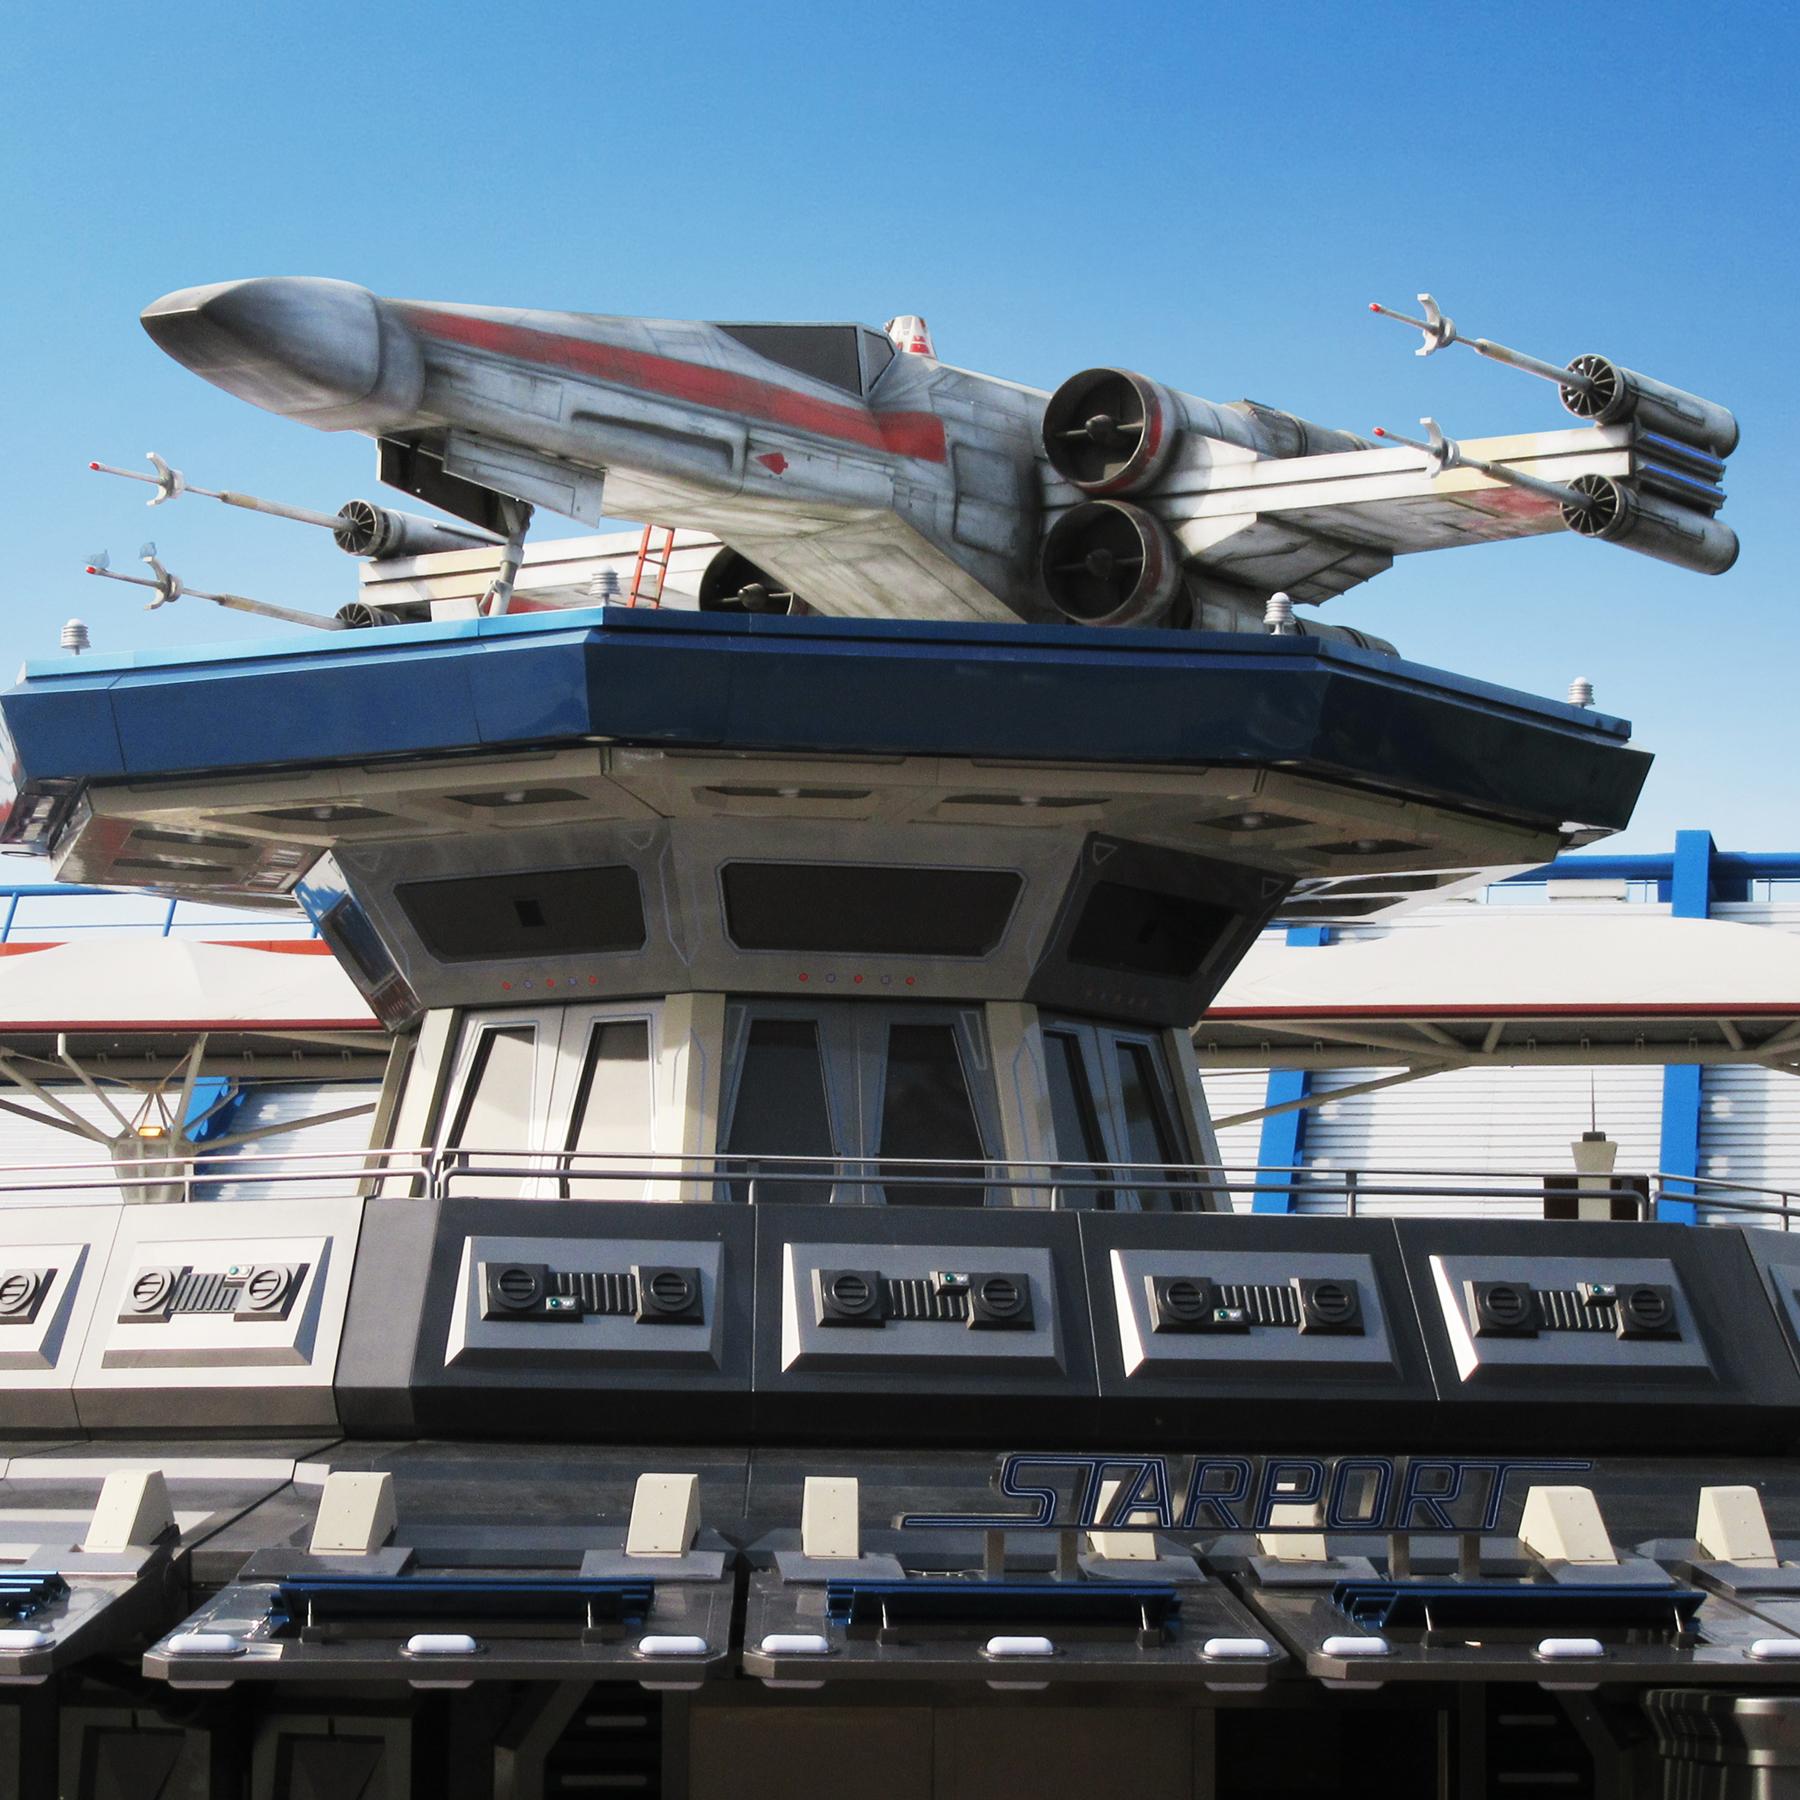 X-wing - Eurodisney